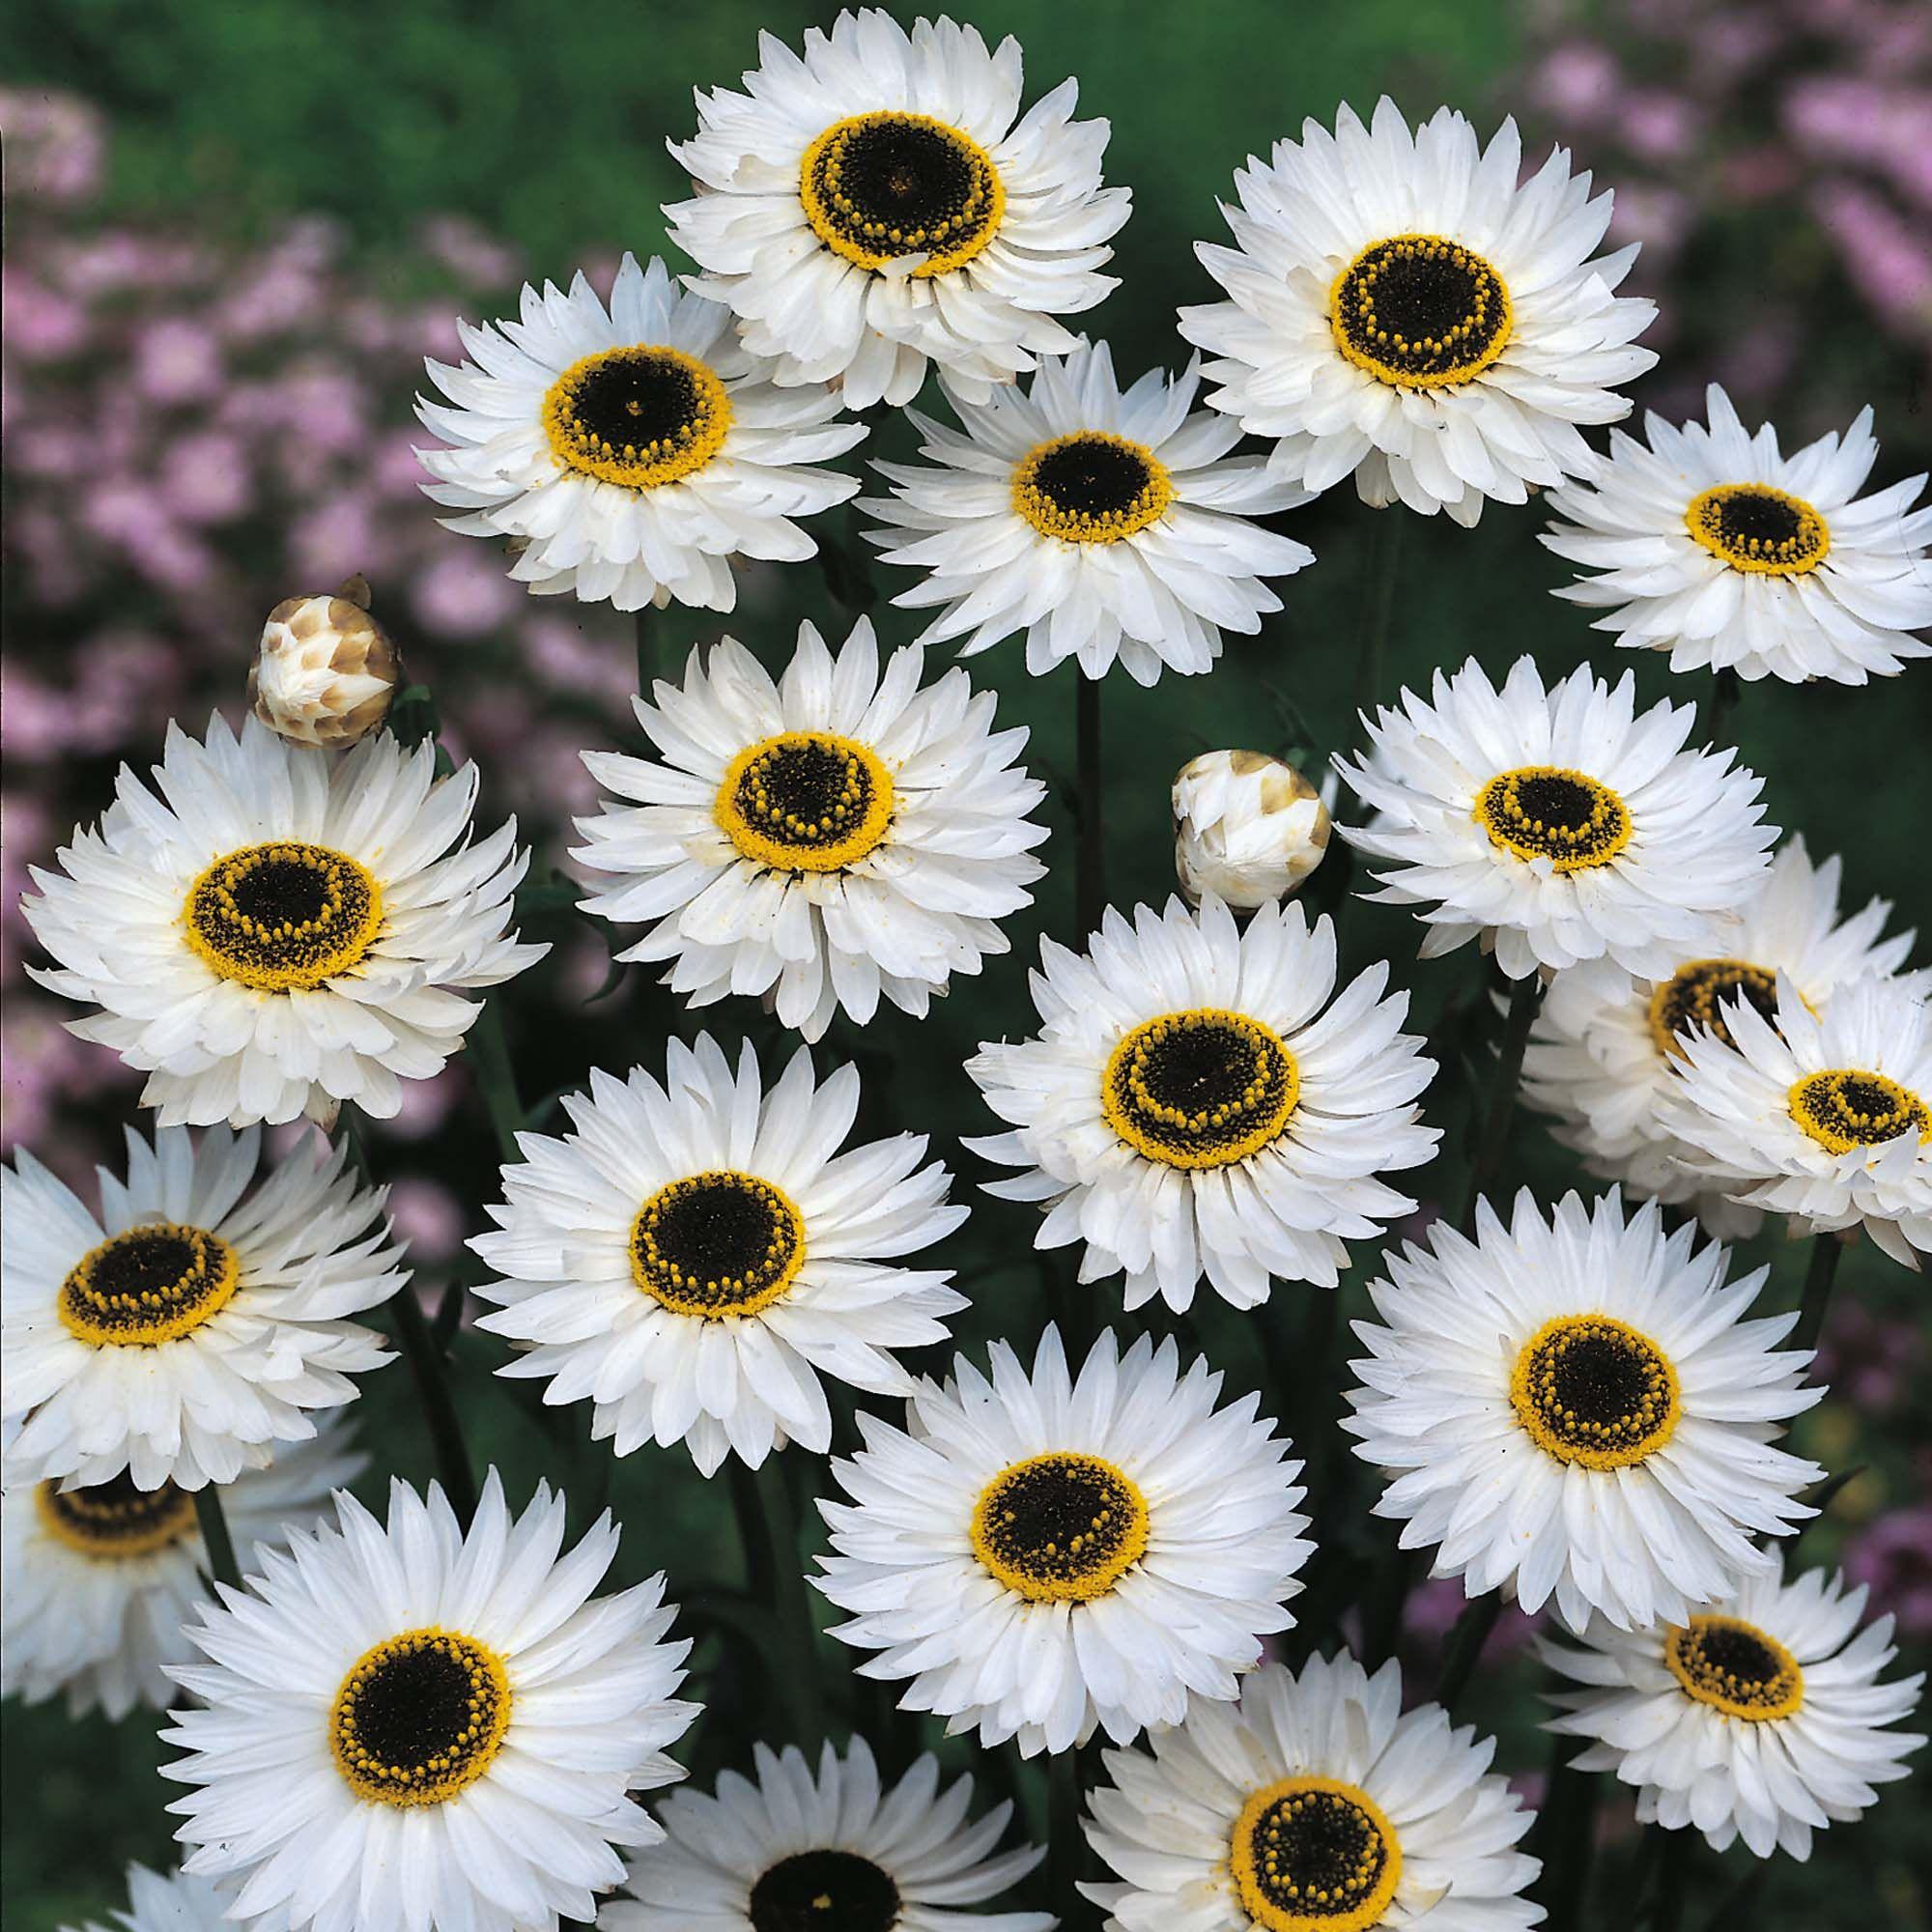 Helipterum pierrot white daisylike strawflowers with